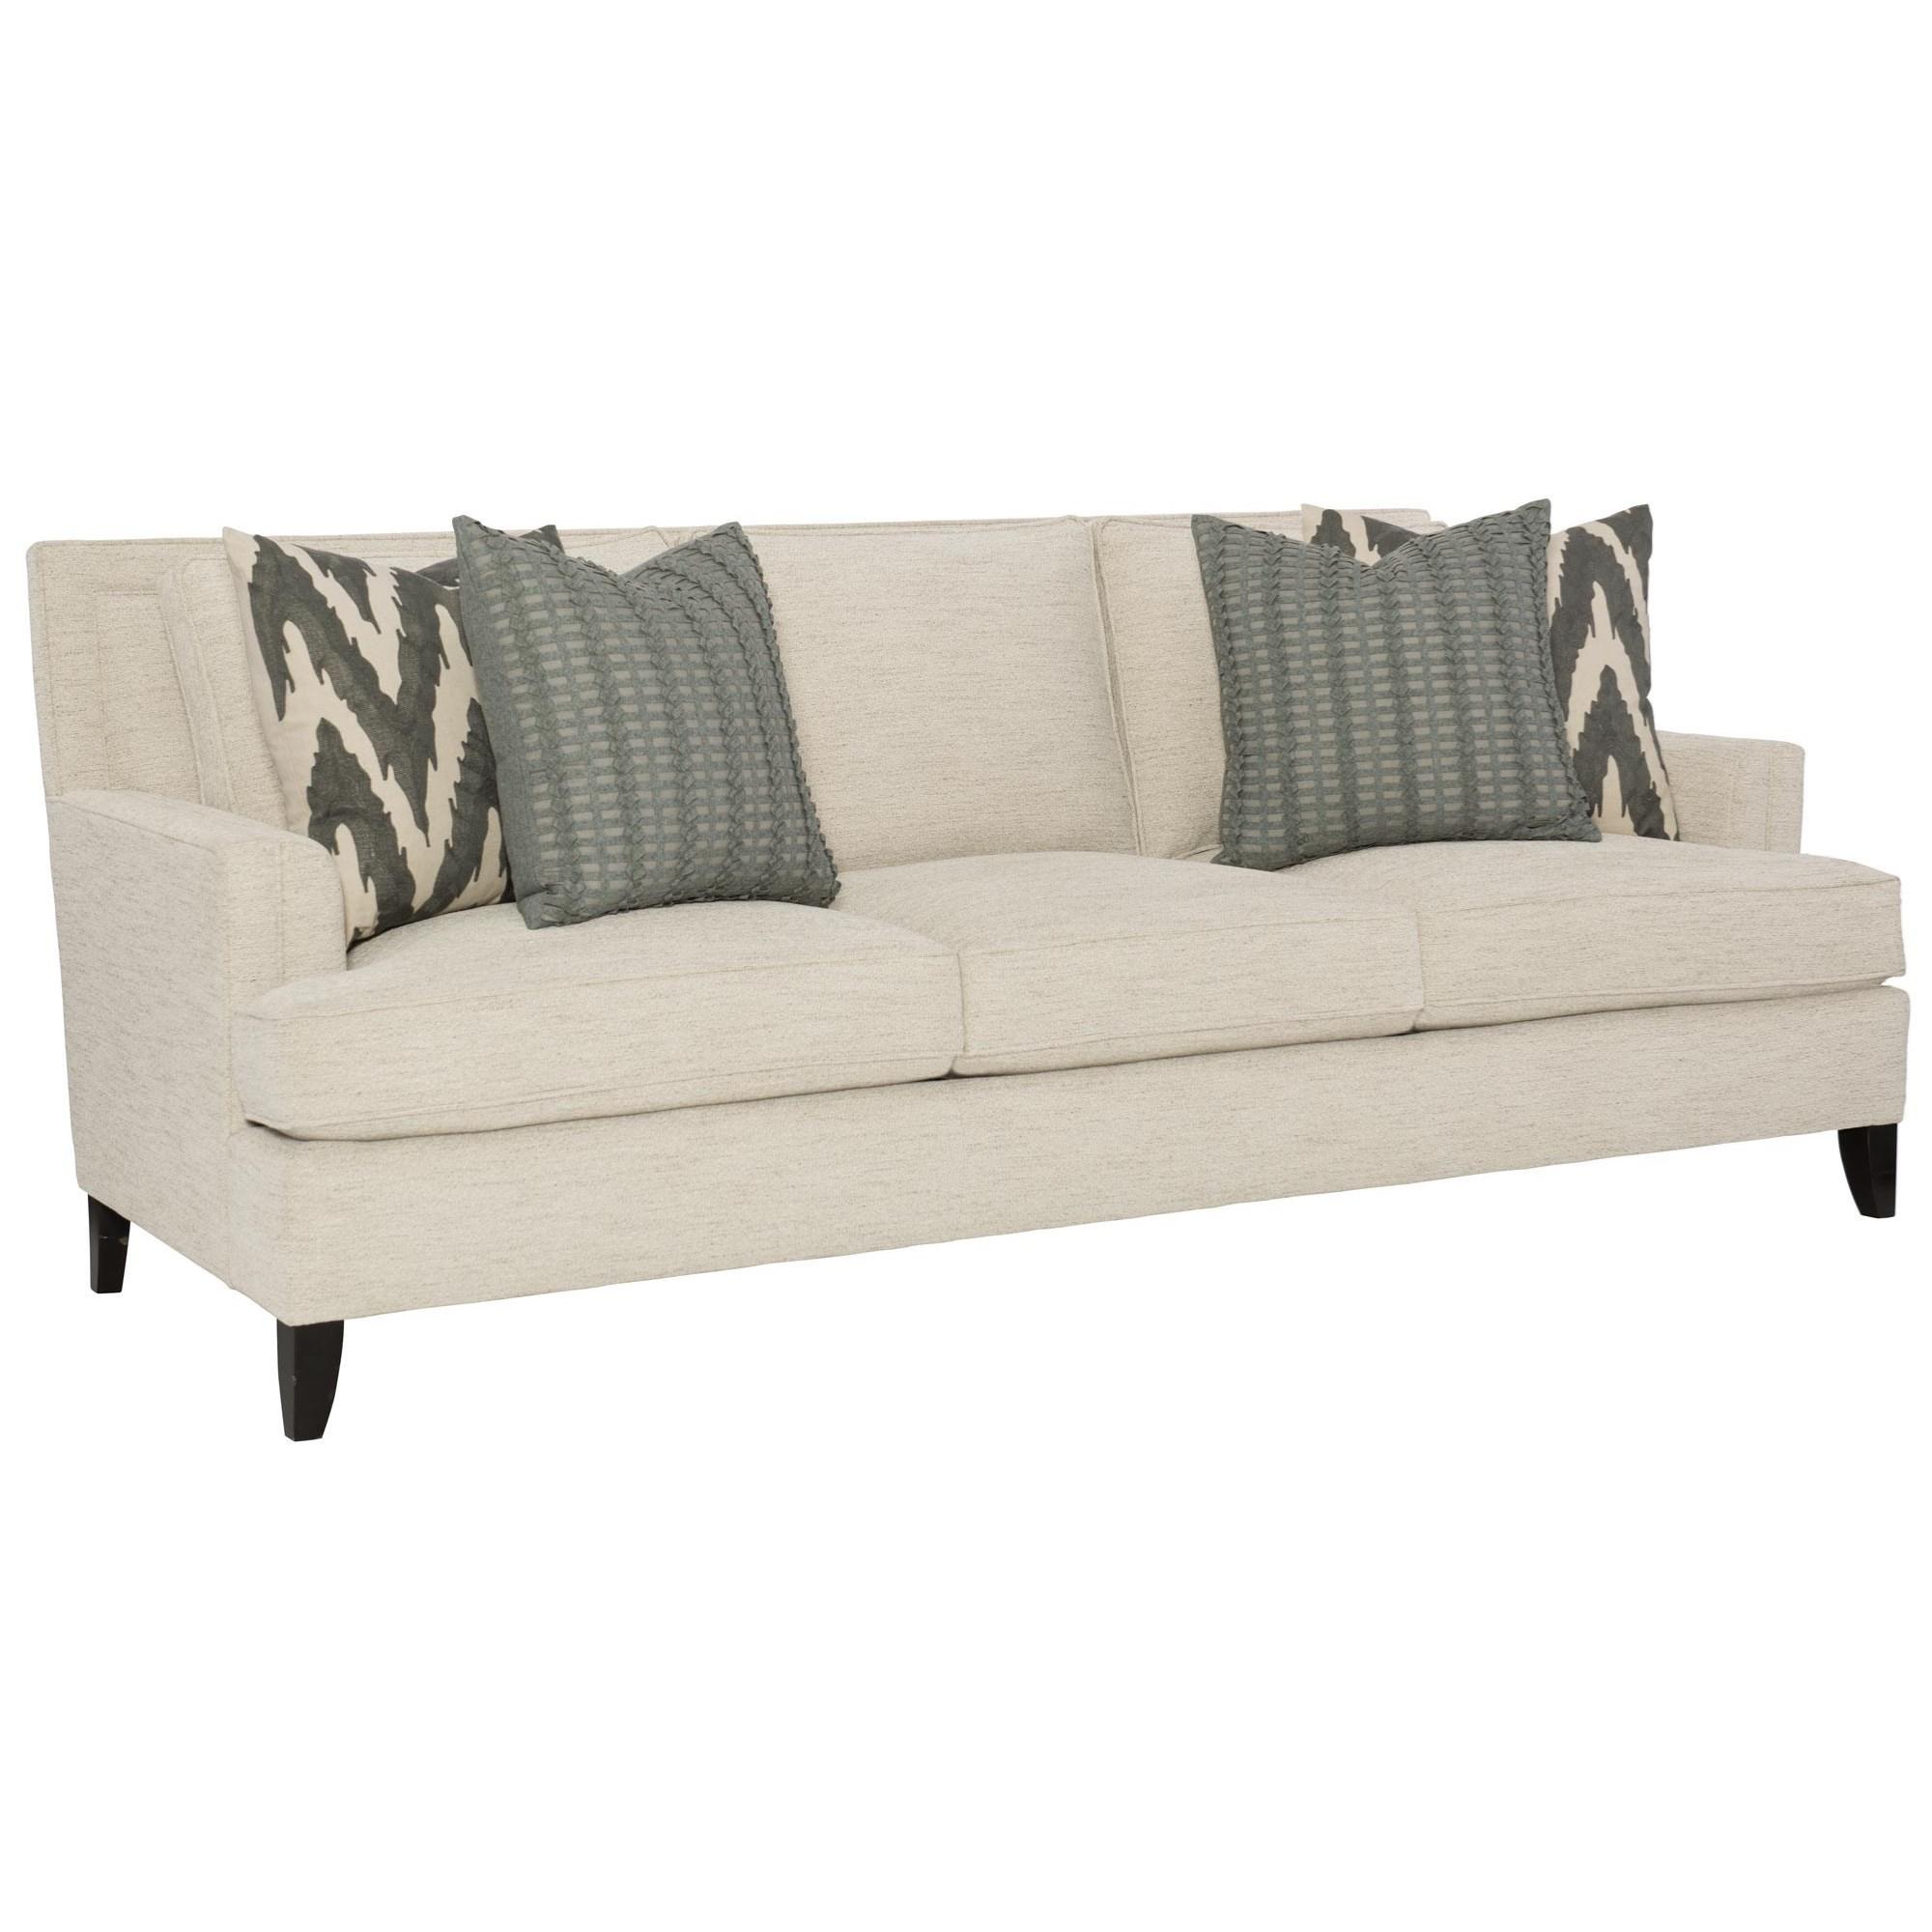 Addison Casual Styled Sofa at Williams & Kay